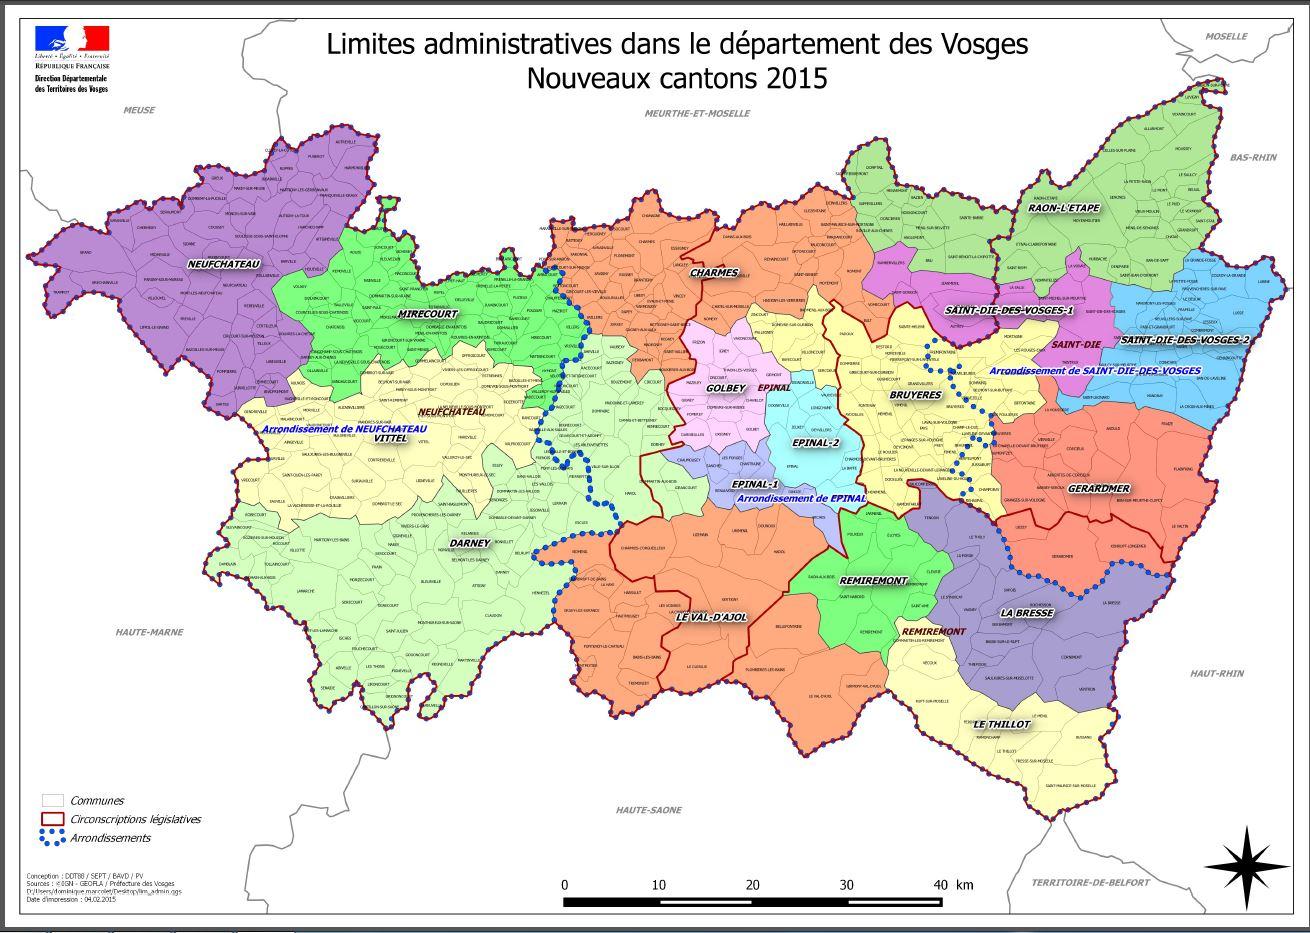 Les vosges carte for Vosges code postal